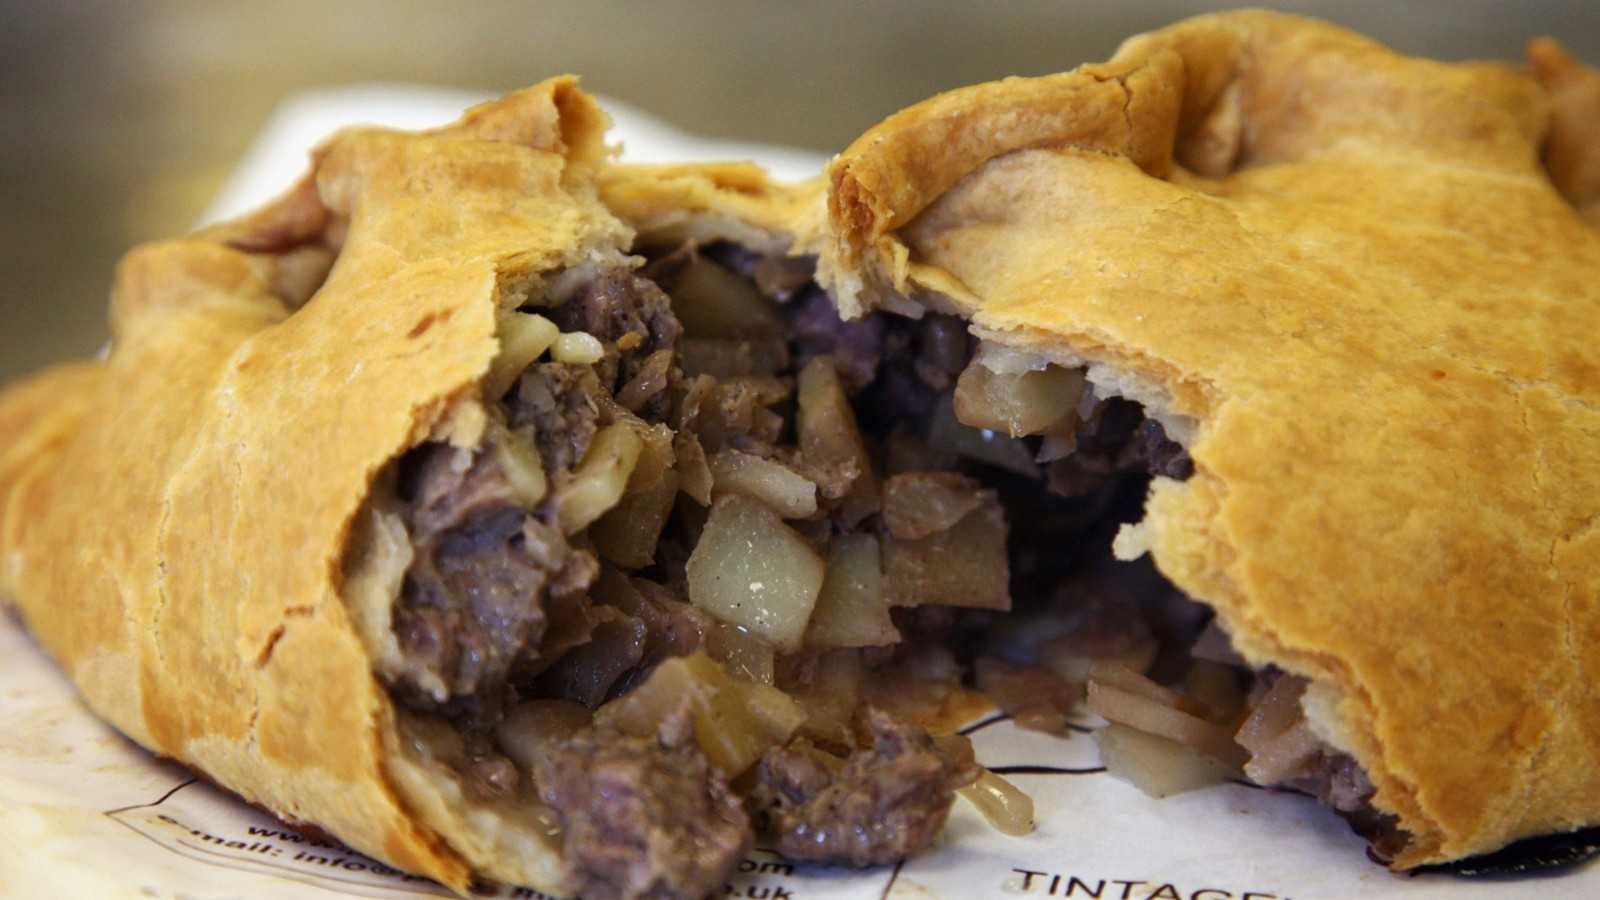 The humble Cornish pasty